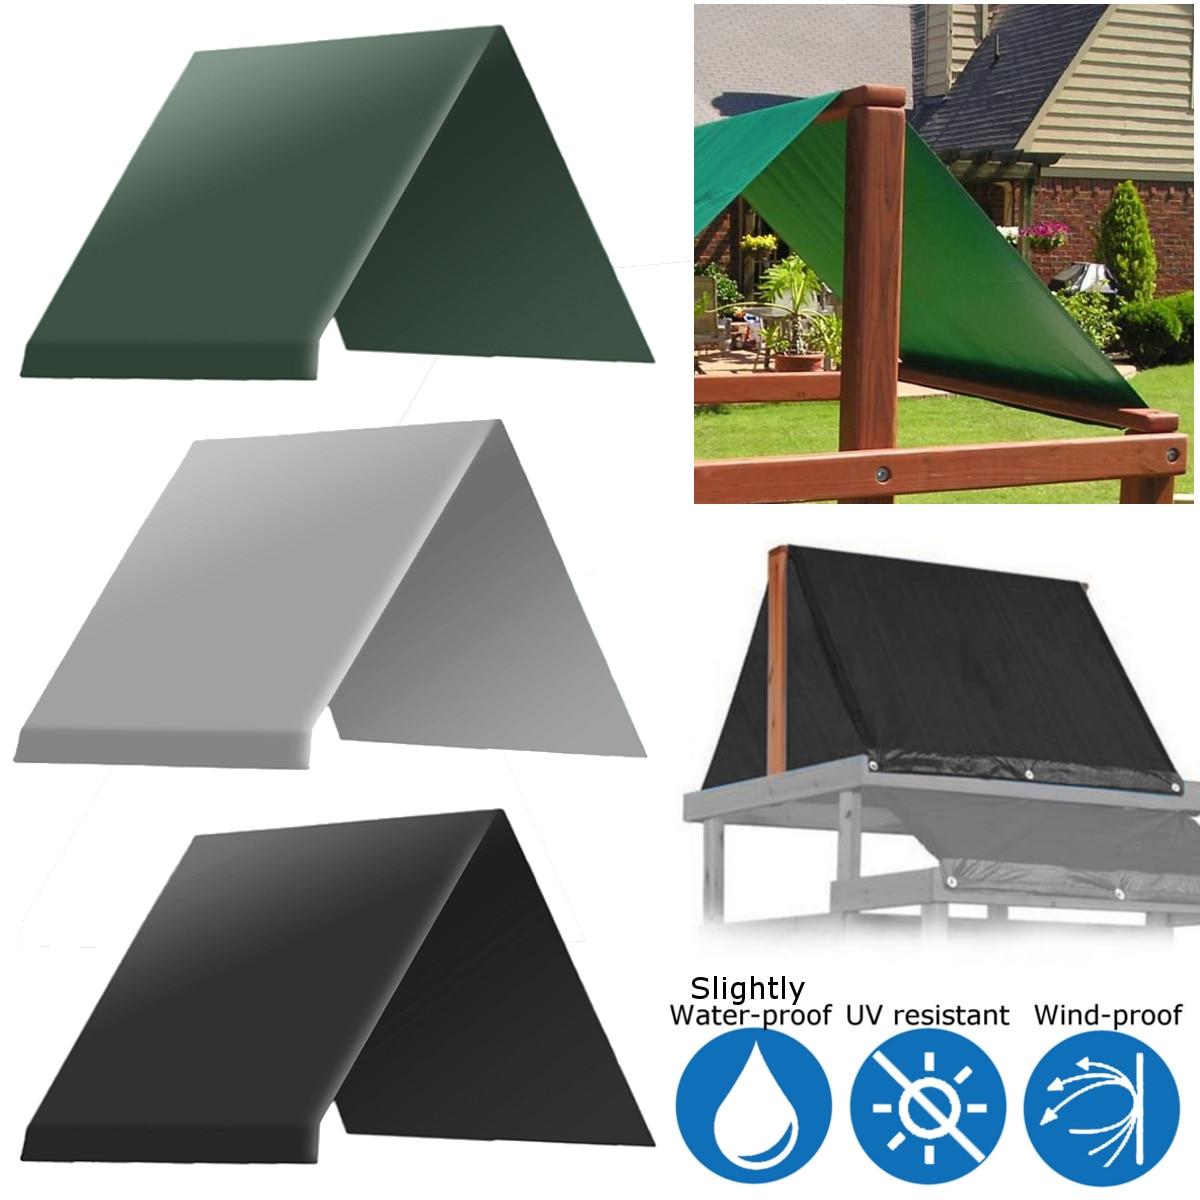 Integrated Playground Equipment Waterproof Hood Garden Swing Chair